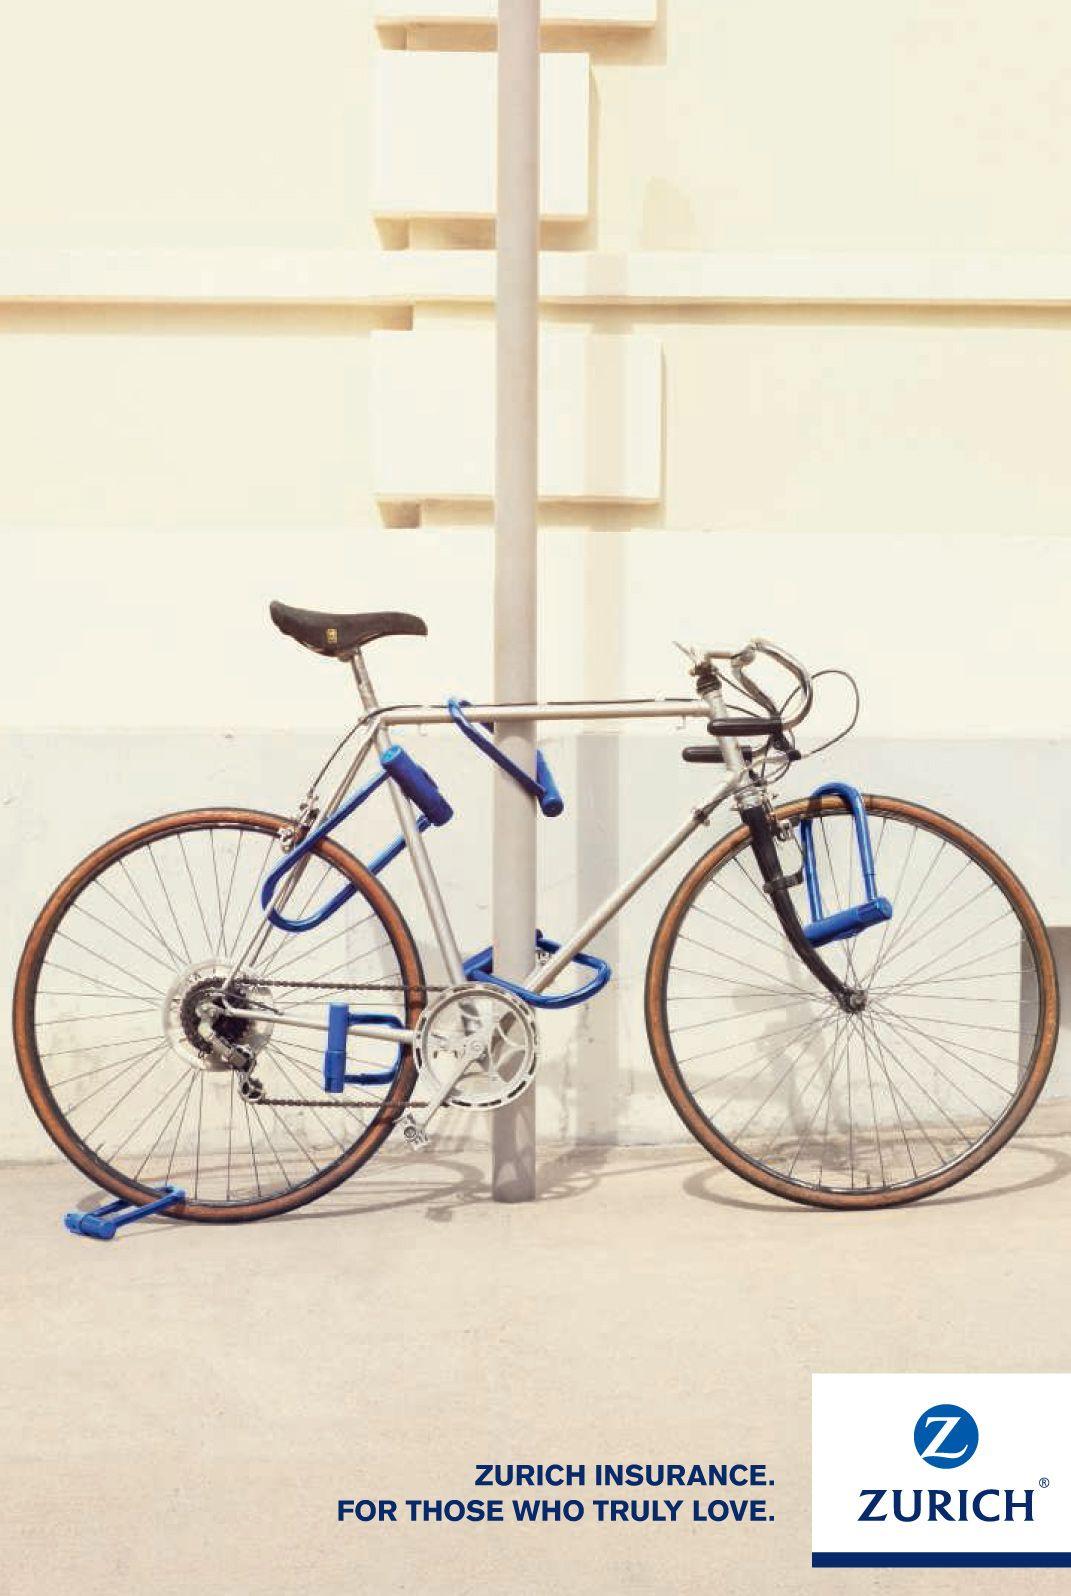 Zurich Insurance Company Bike Insurance ads, Print ads